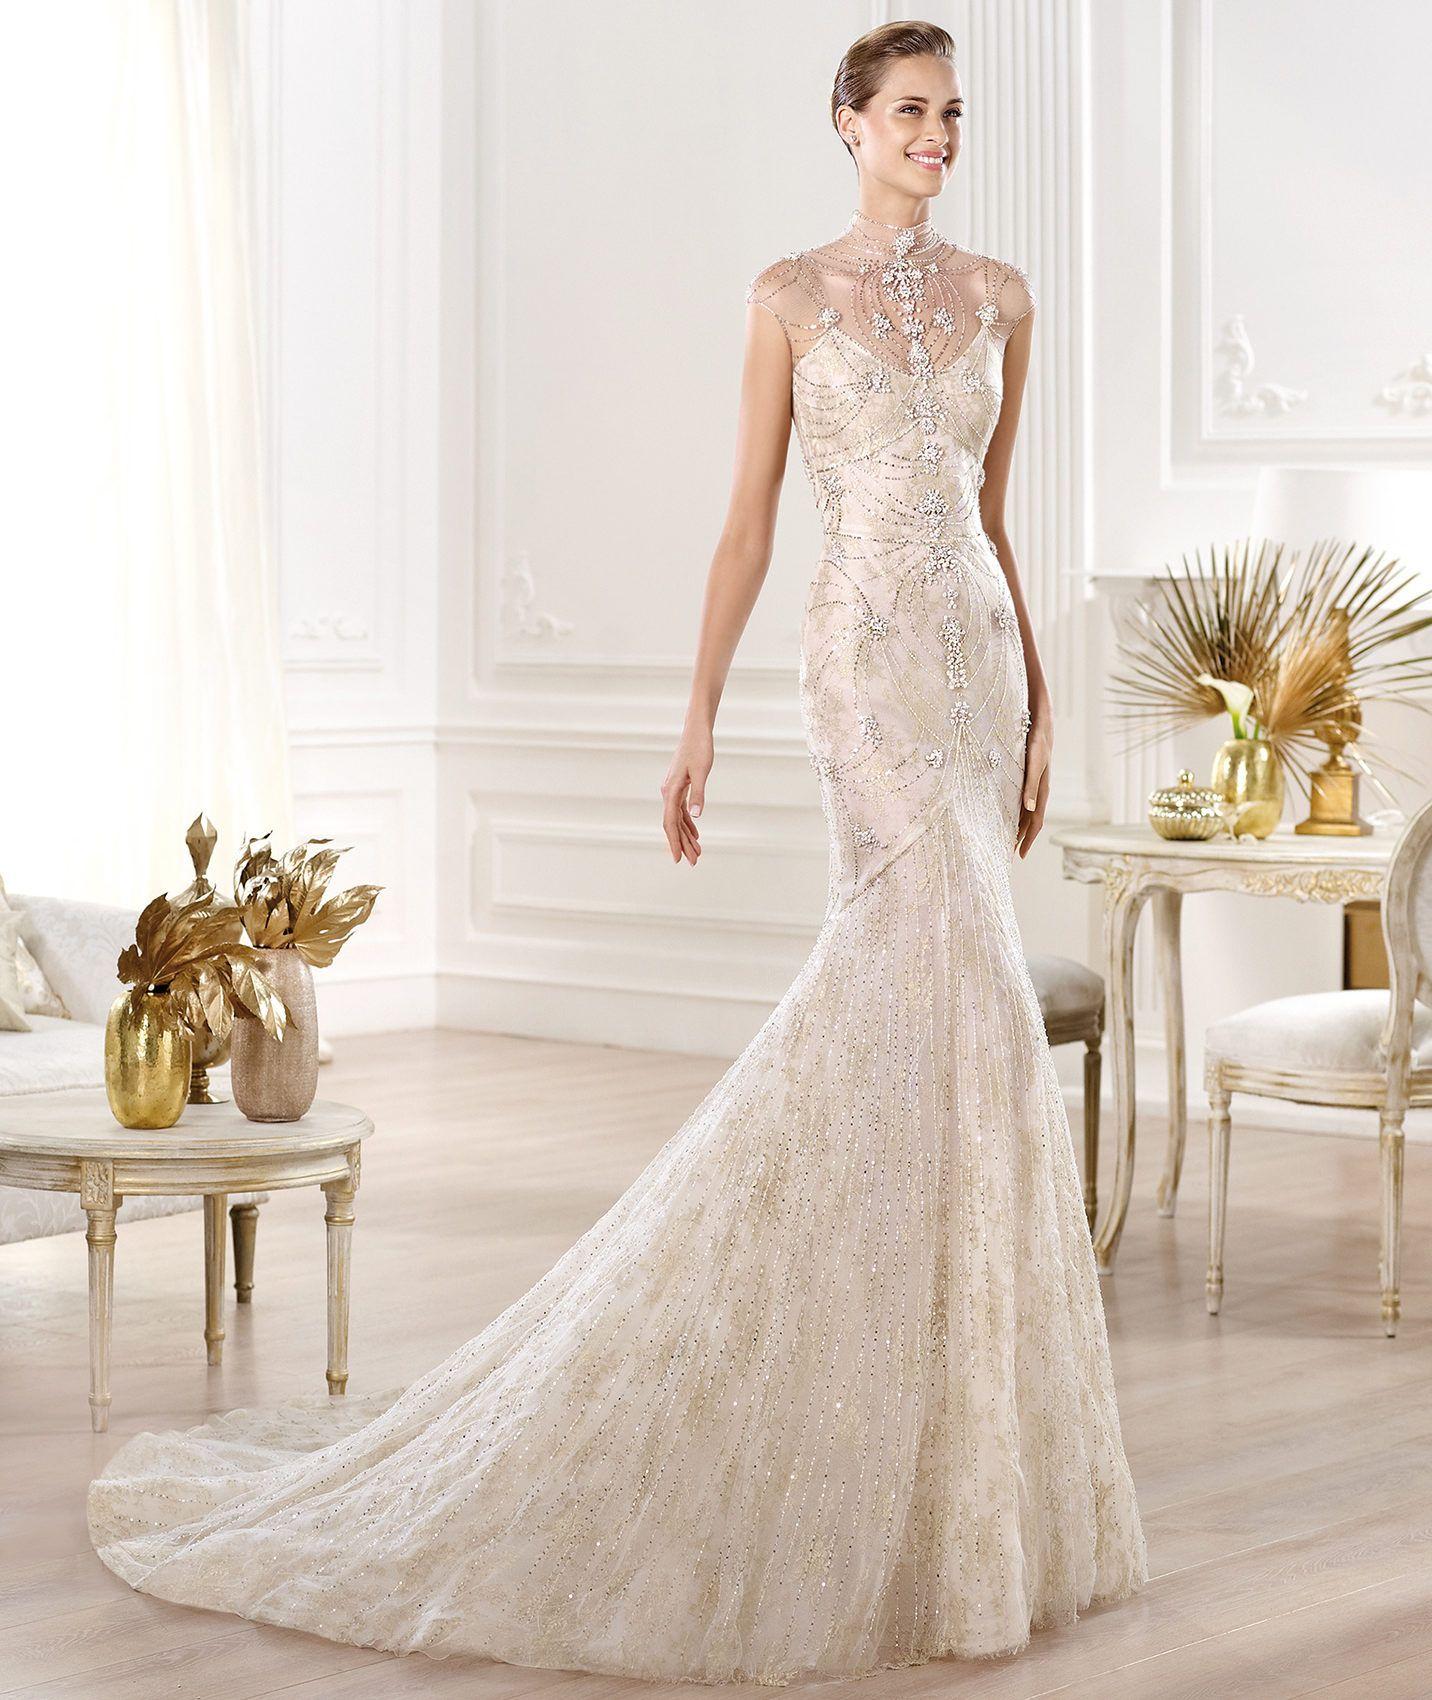 Wedding Dress Yalim Model Atelier Pronovias 2014 Collection Round Neckline